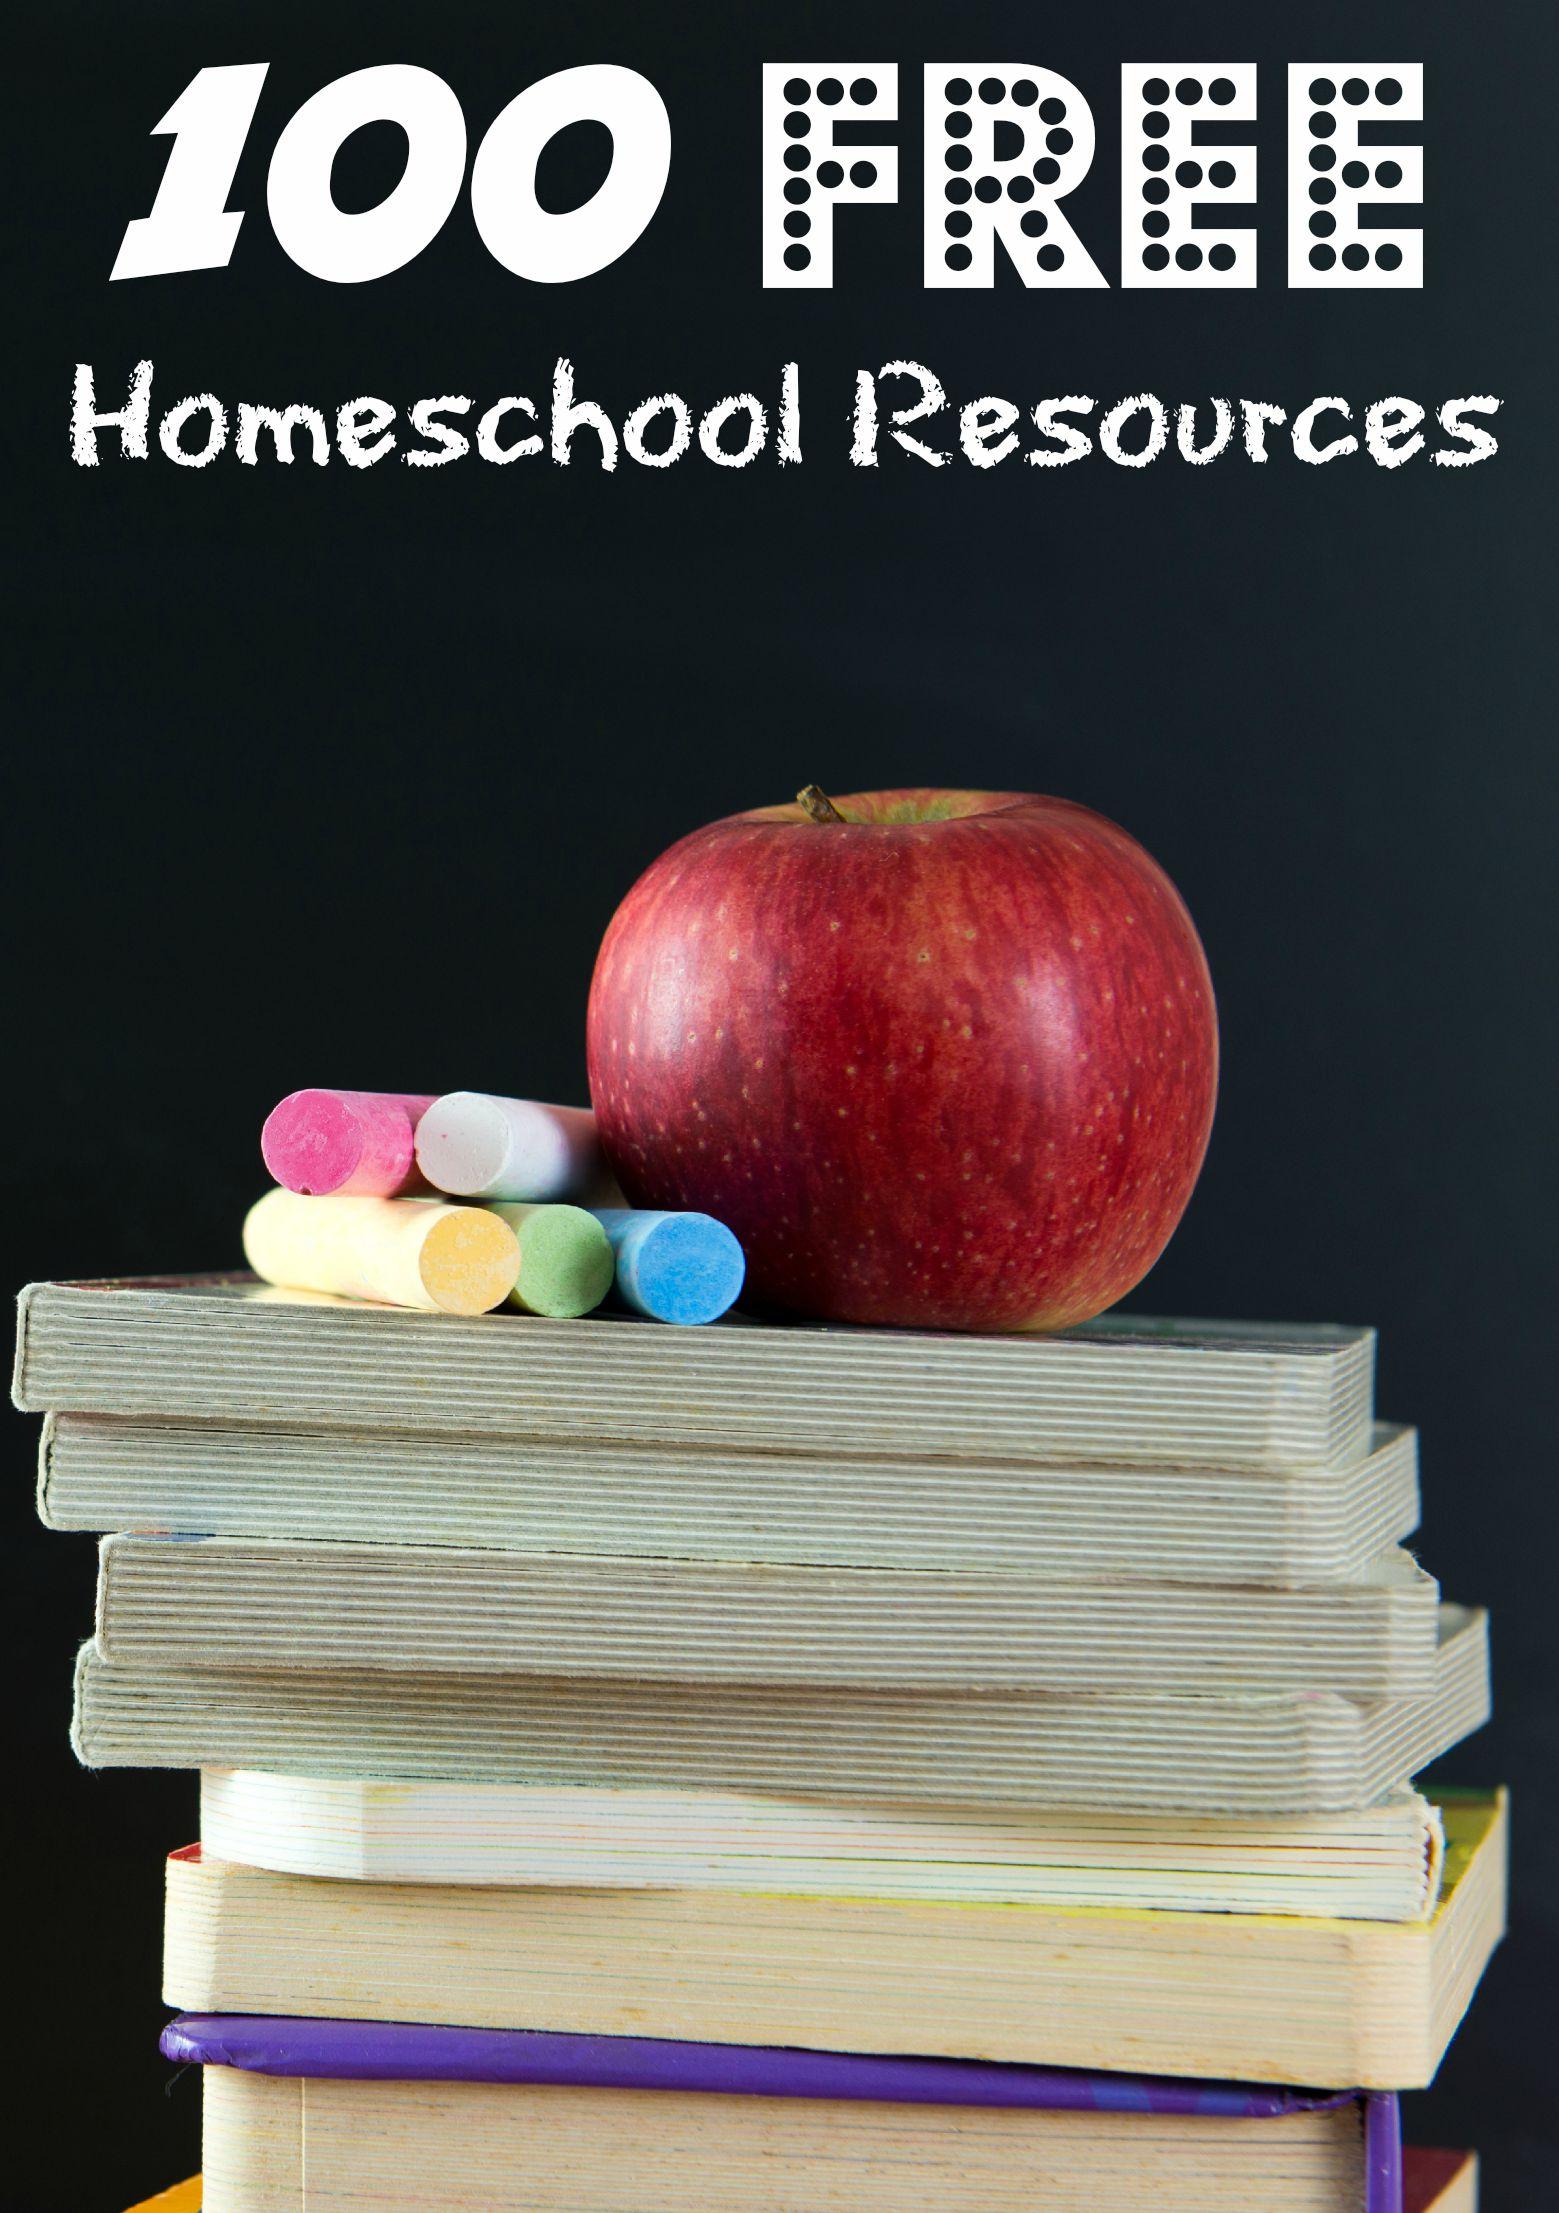 100 Free Homeschool Resources